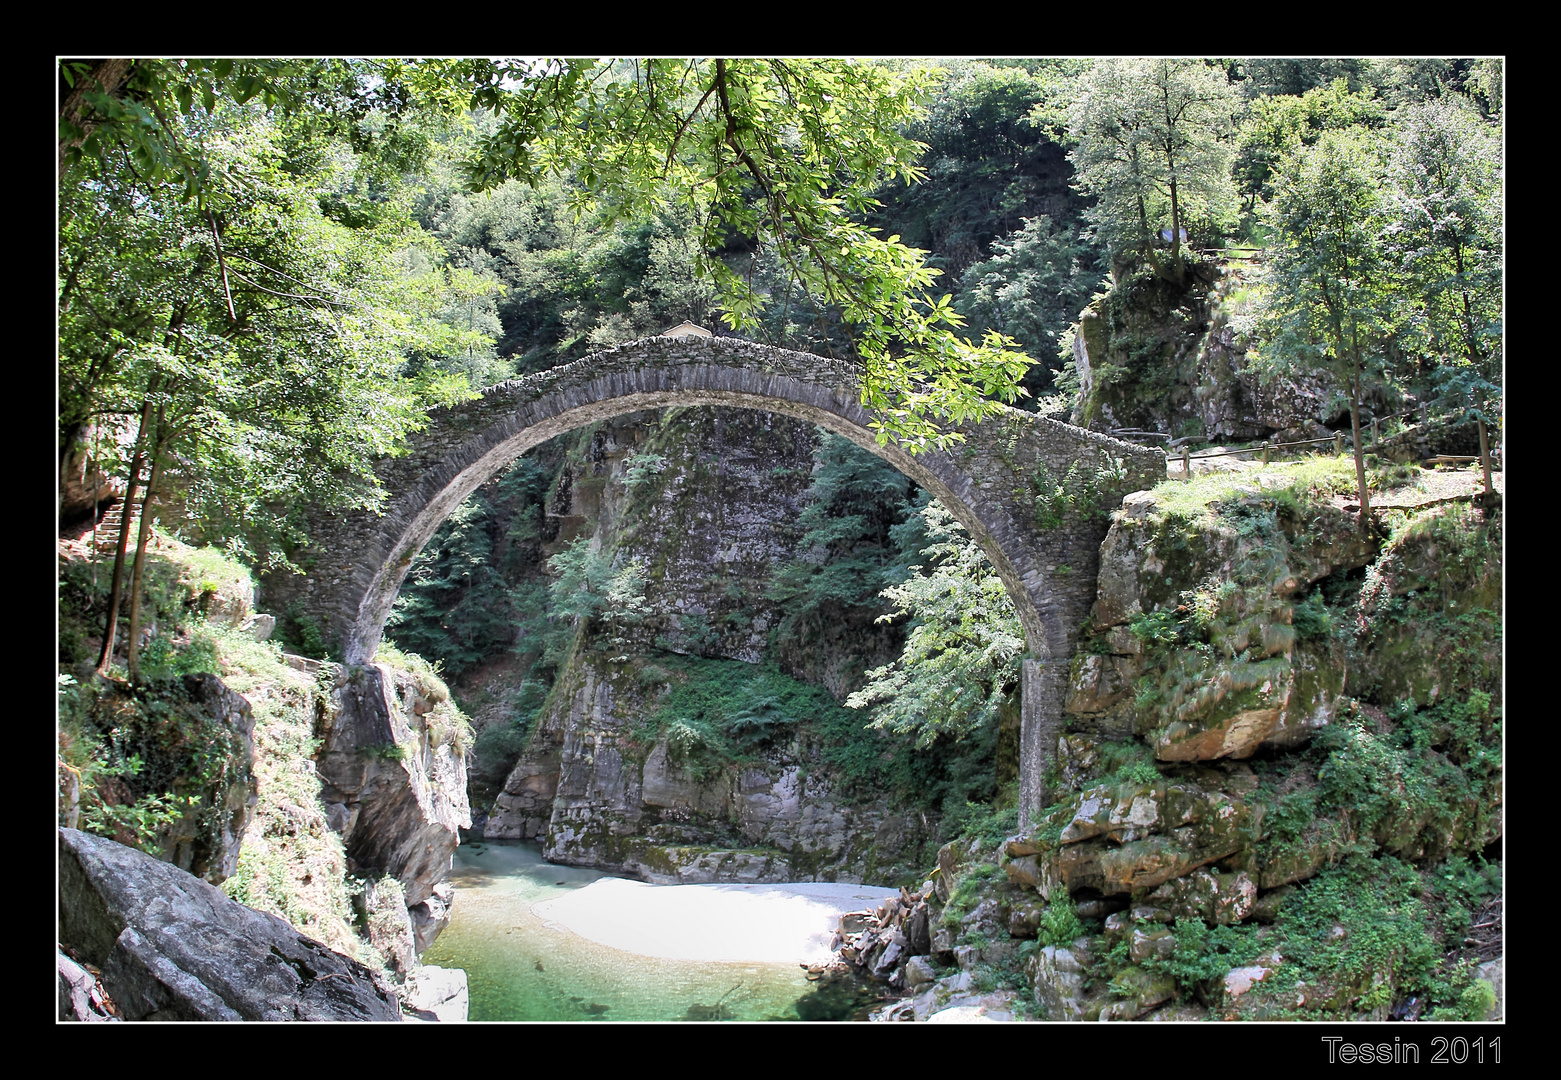 Tessin 2011 Ponte Romano - Intragna